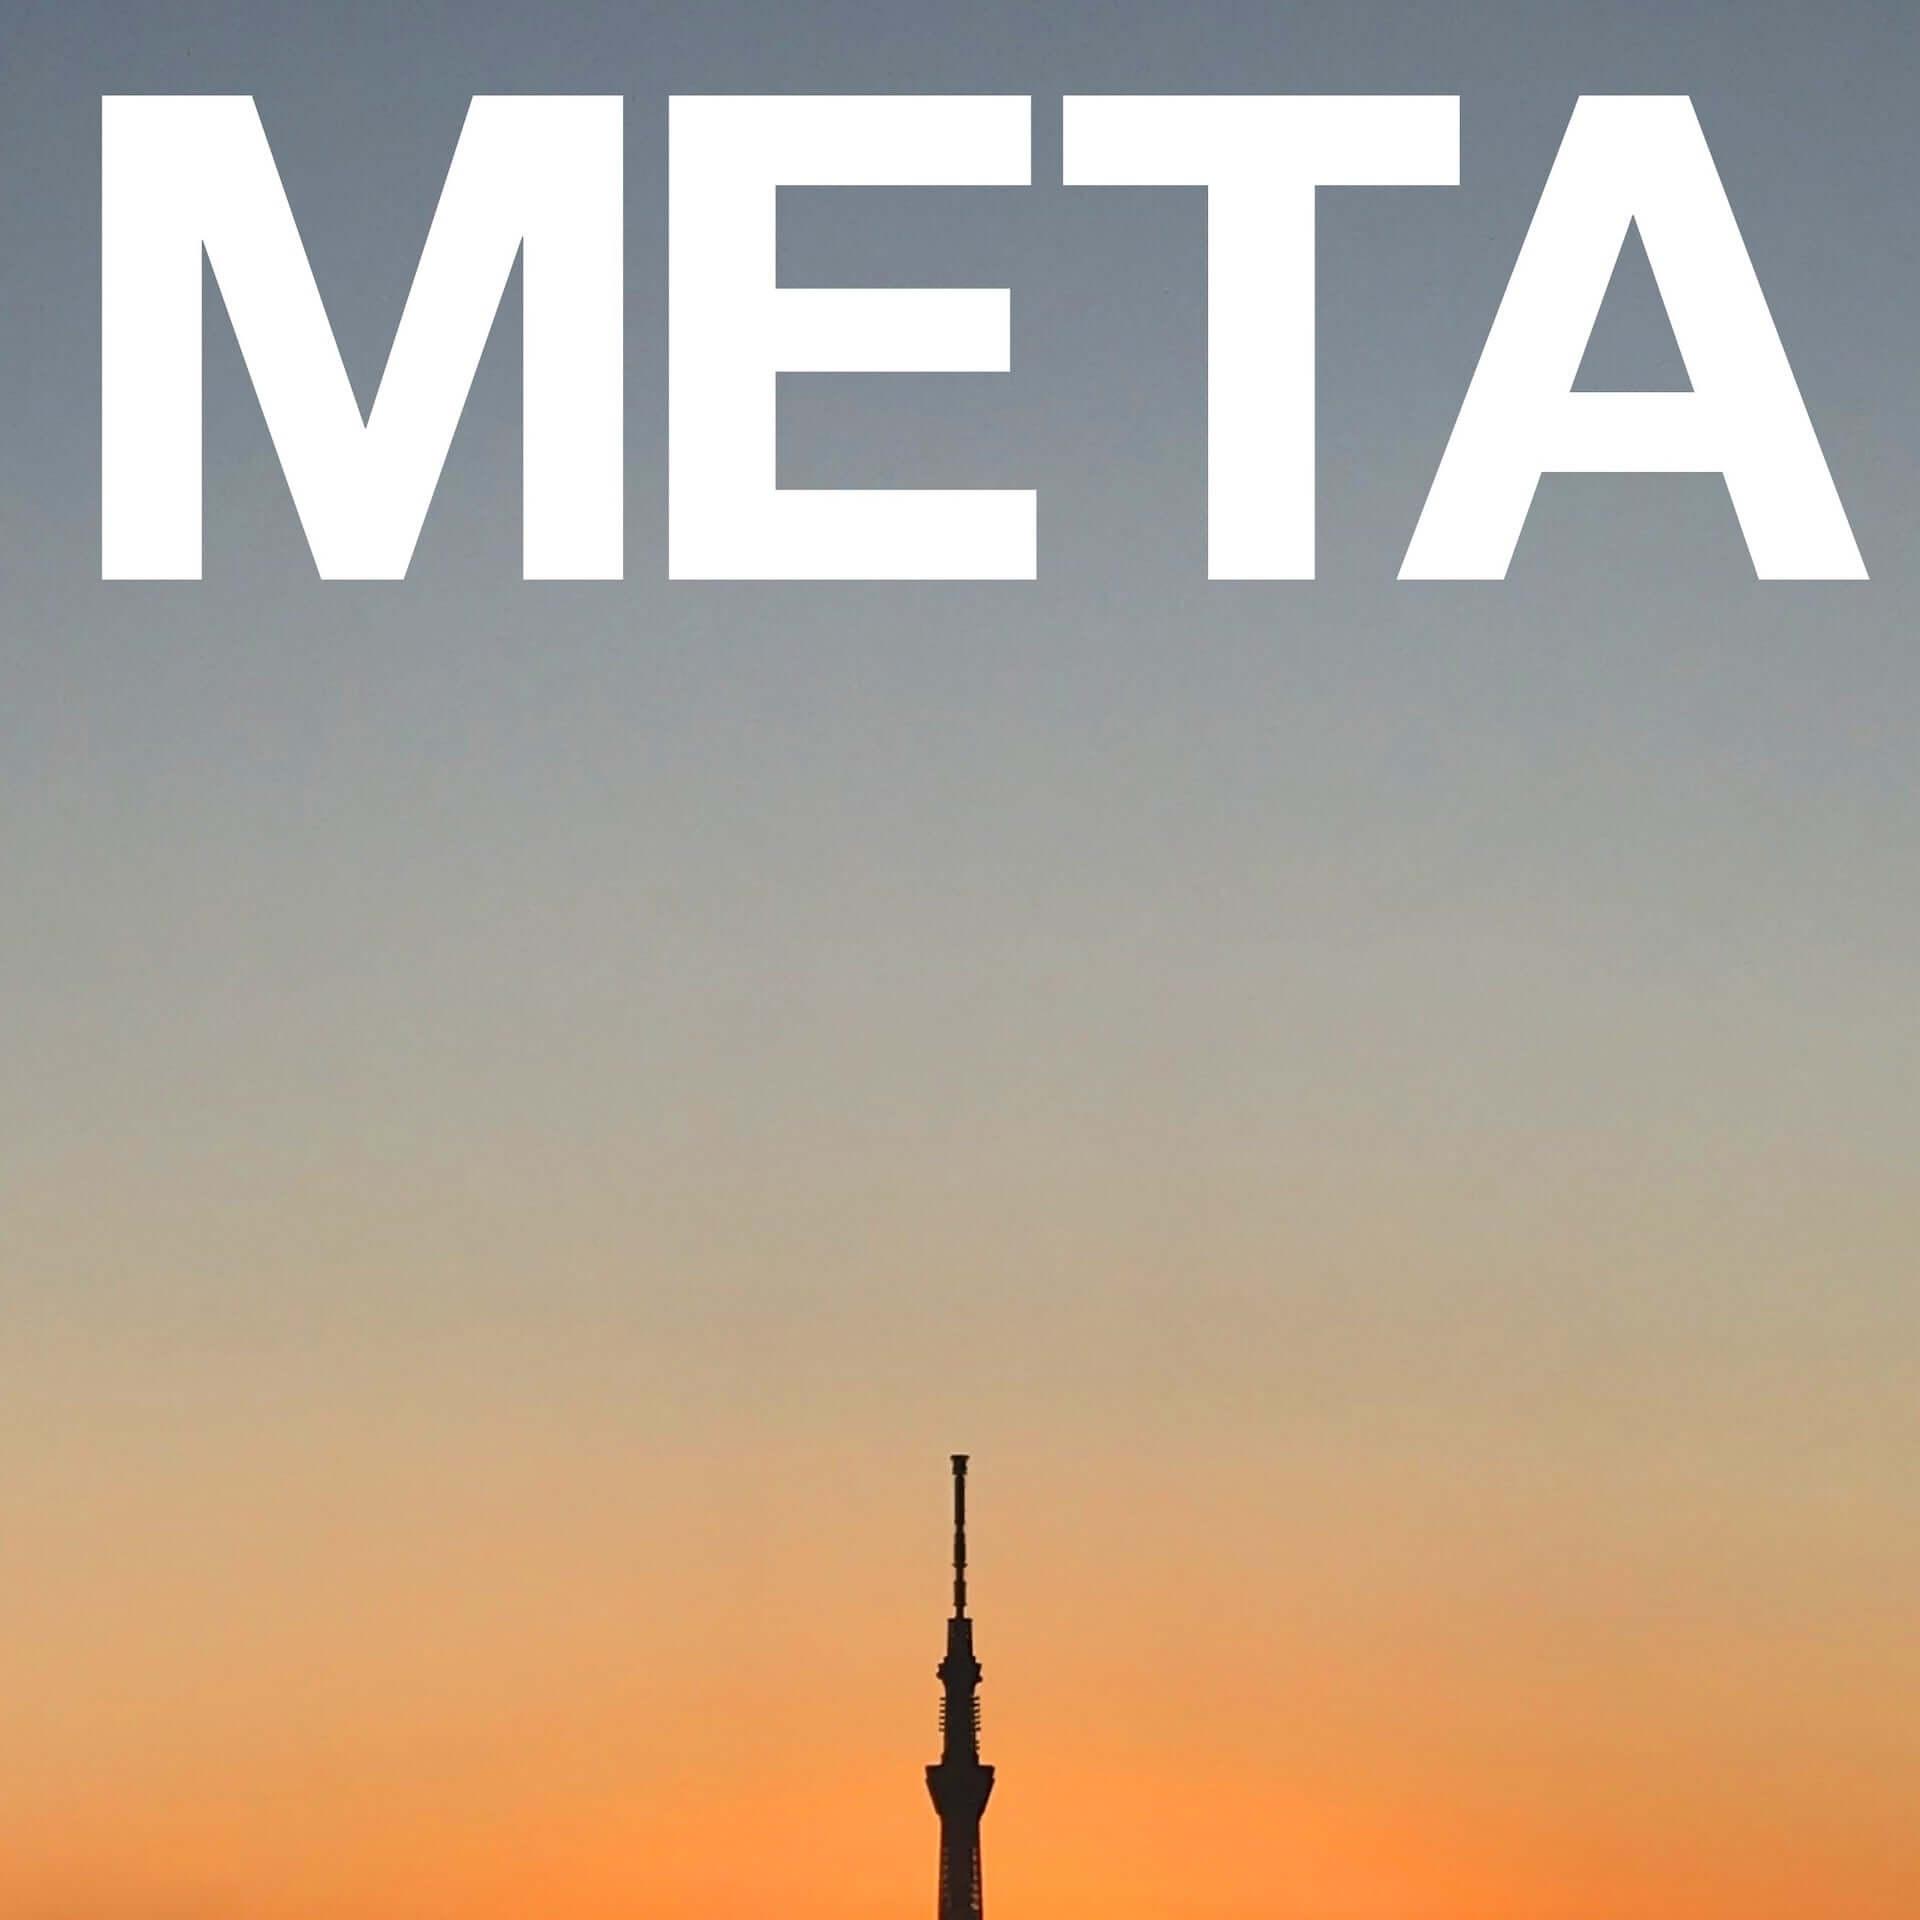 "METAFIVEがニューシングル""環境と心理""のMVを公開!『METAFIVE. STILL ALIVE.』も手掛けた中村勇吾が監督 music200804_metafive_2-1920x1920"